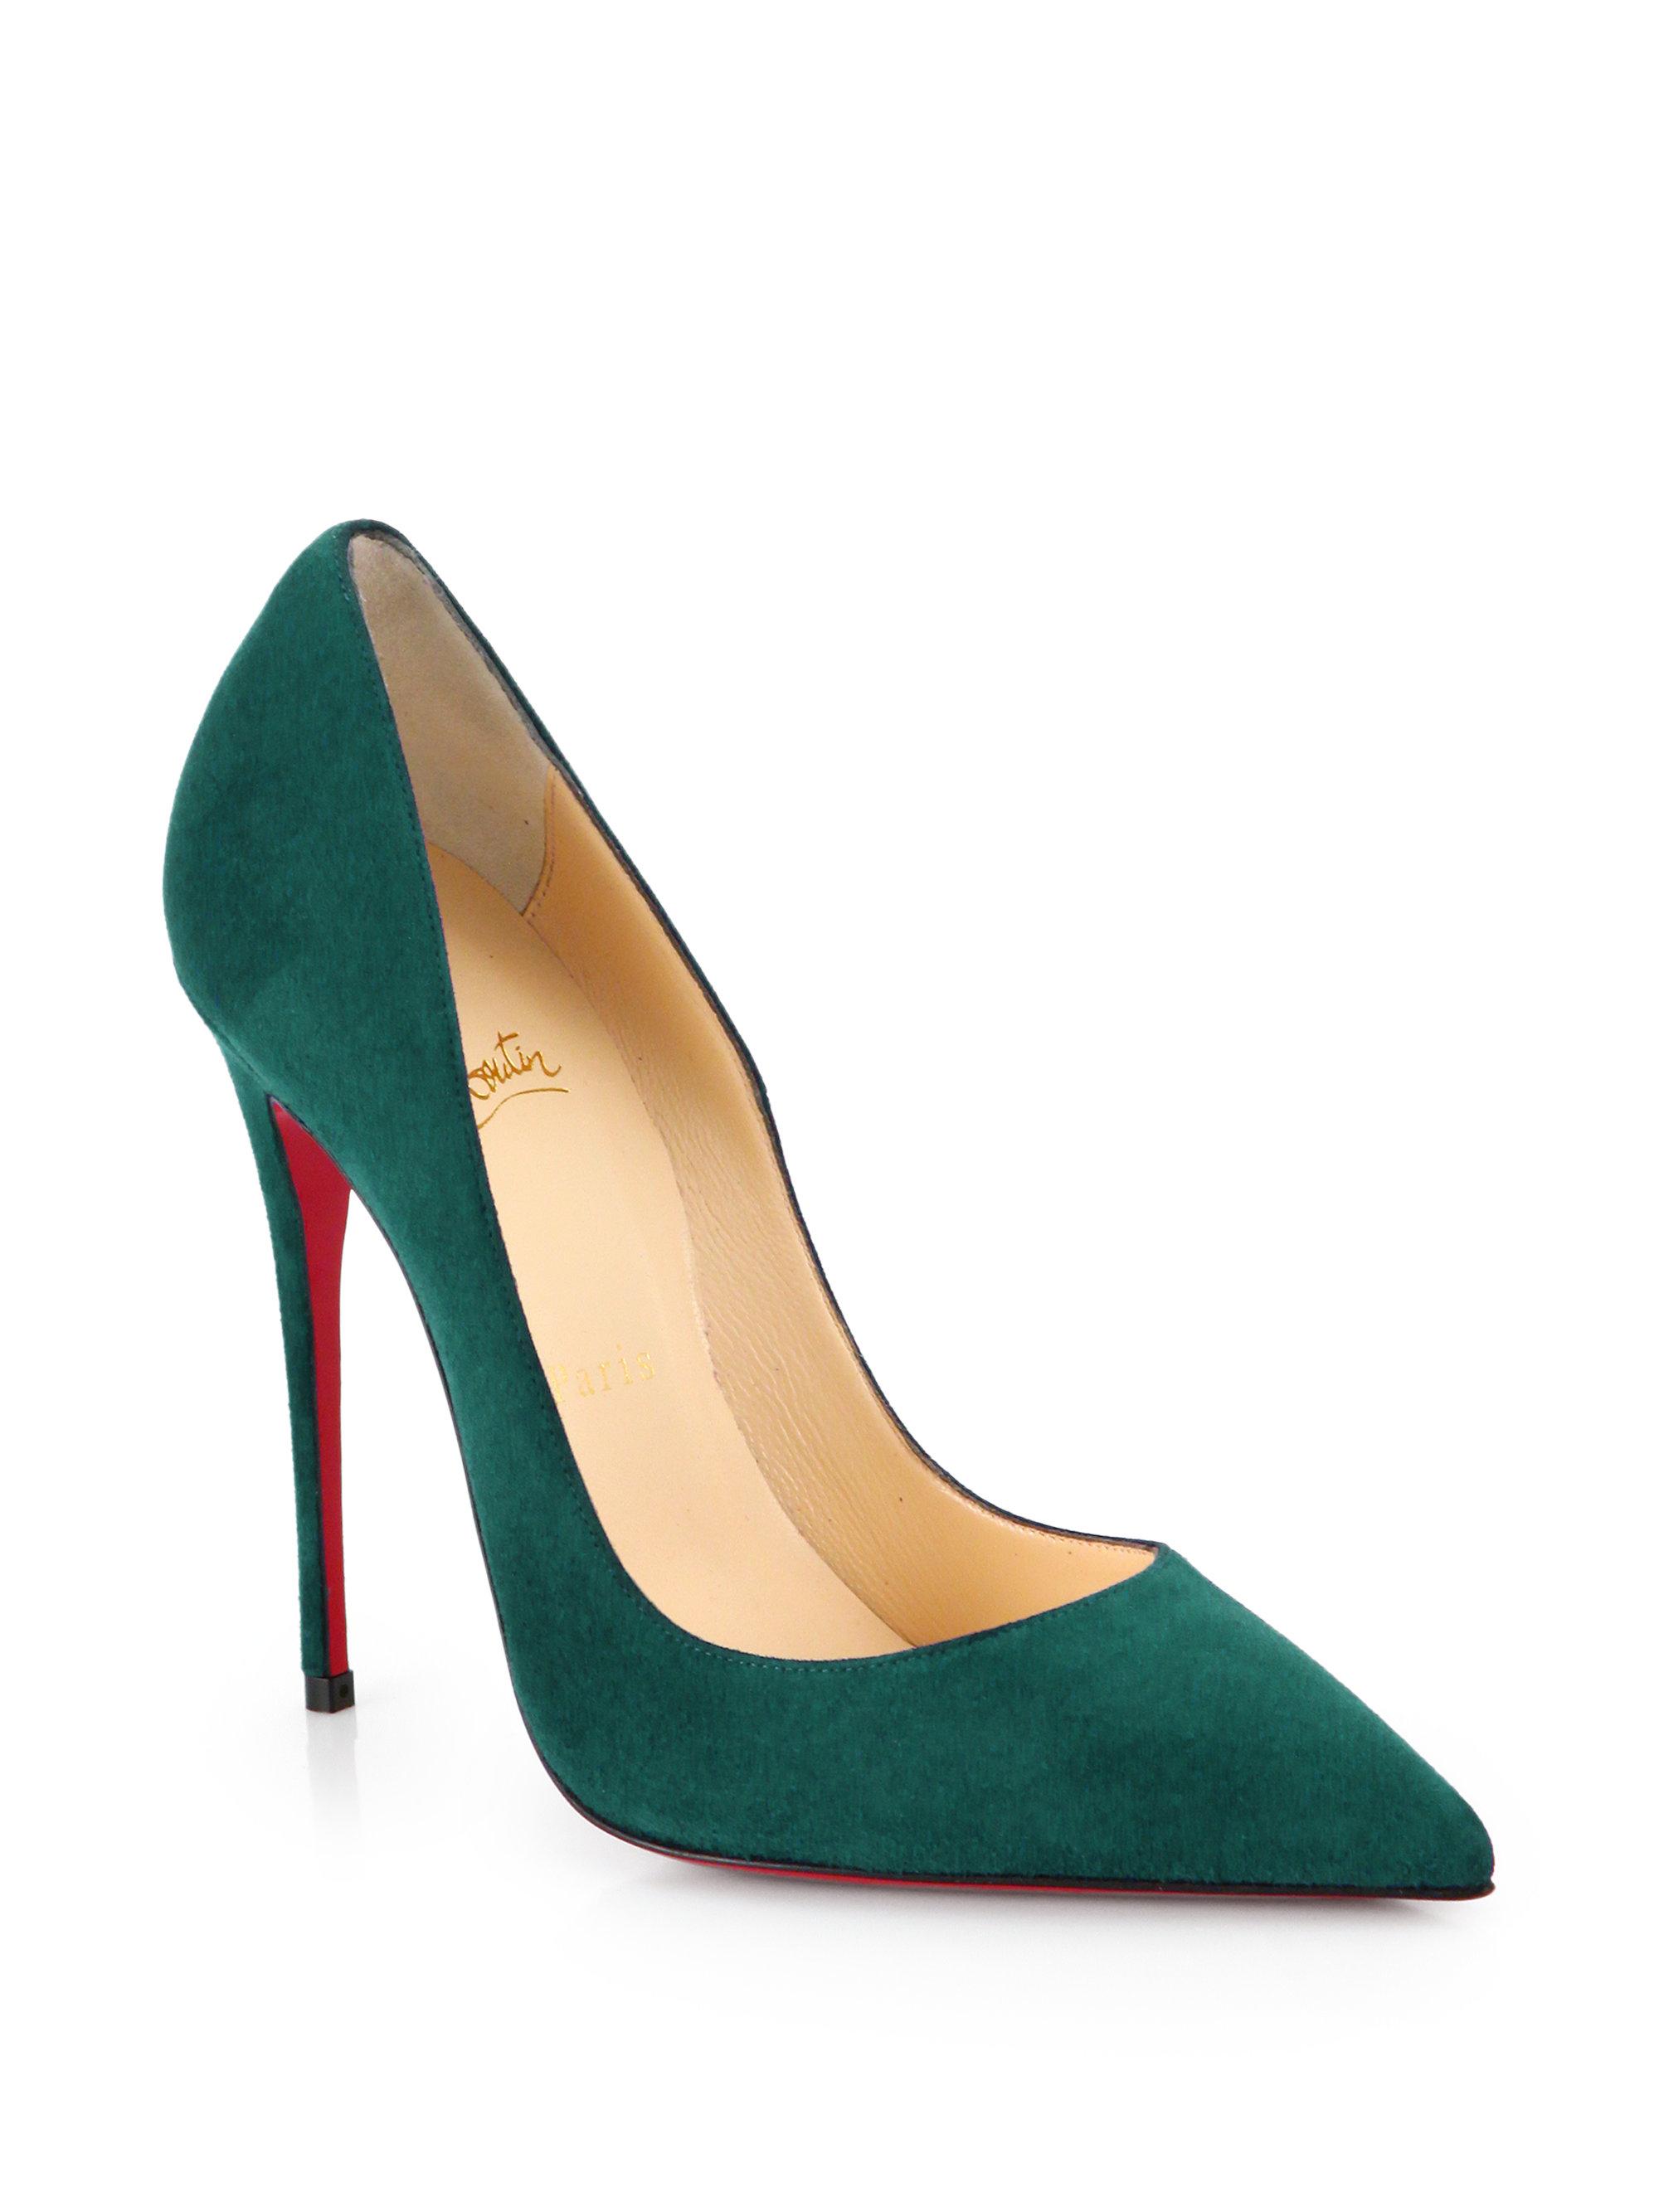 christian louboutin emerald green pumps